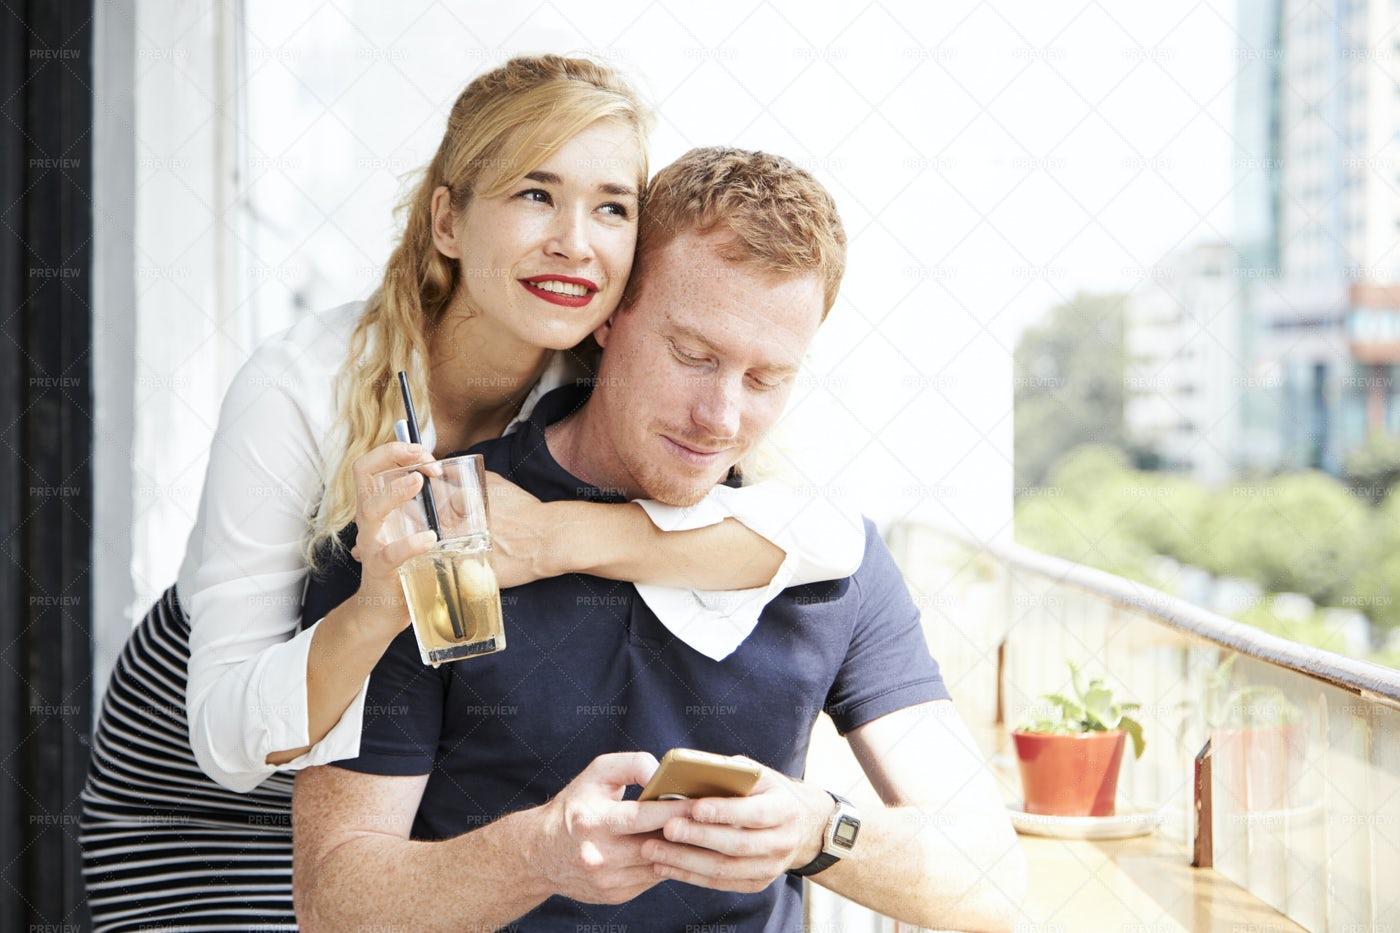 Cheerful Woman Hugging Boyfriend: Stock Photos